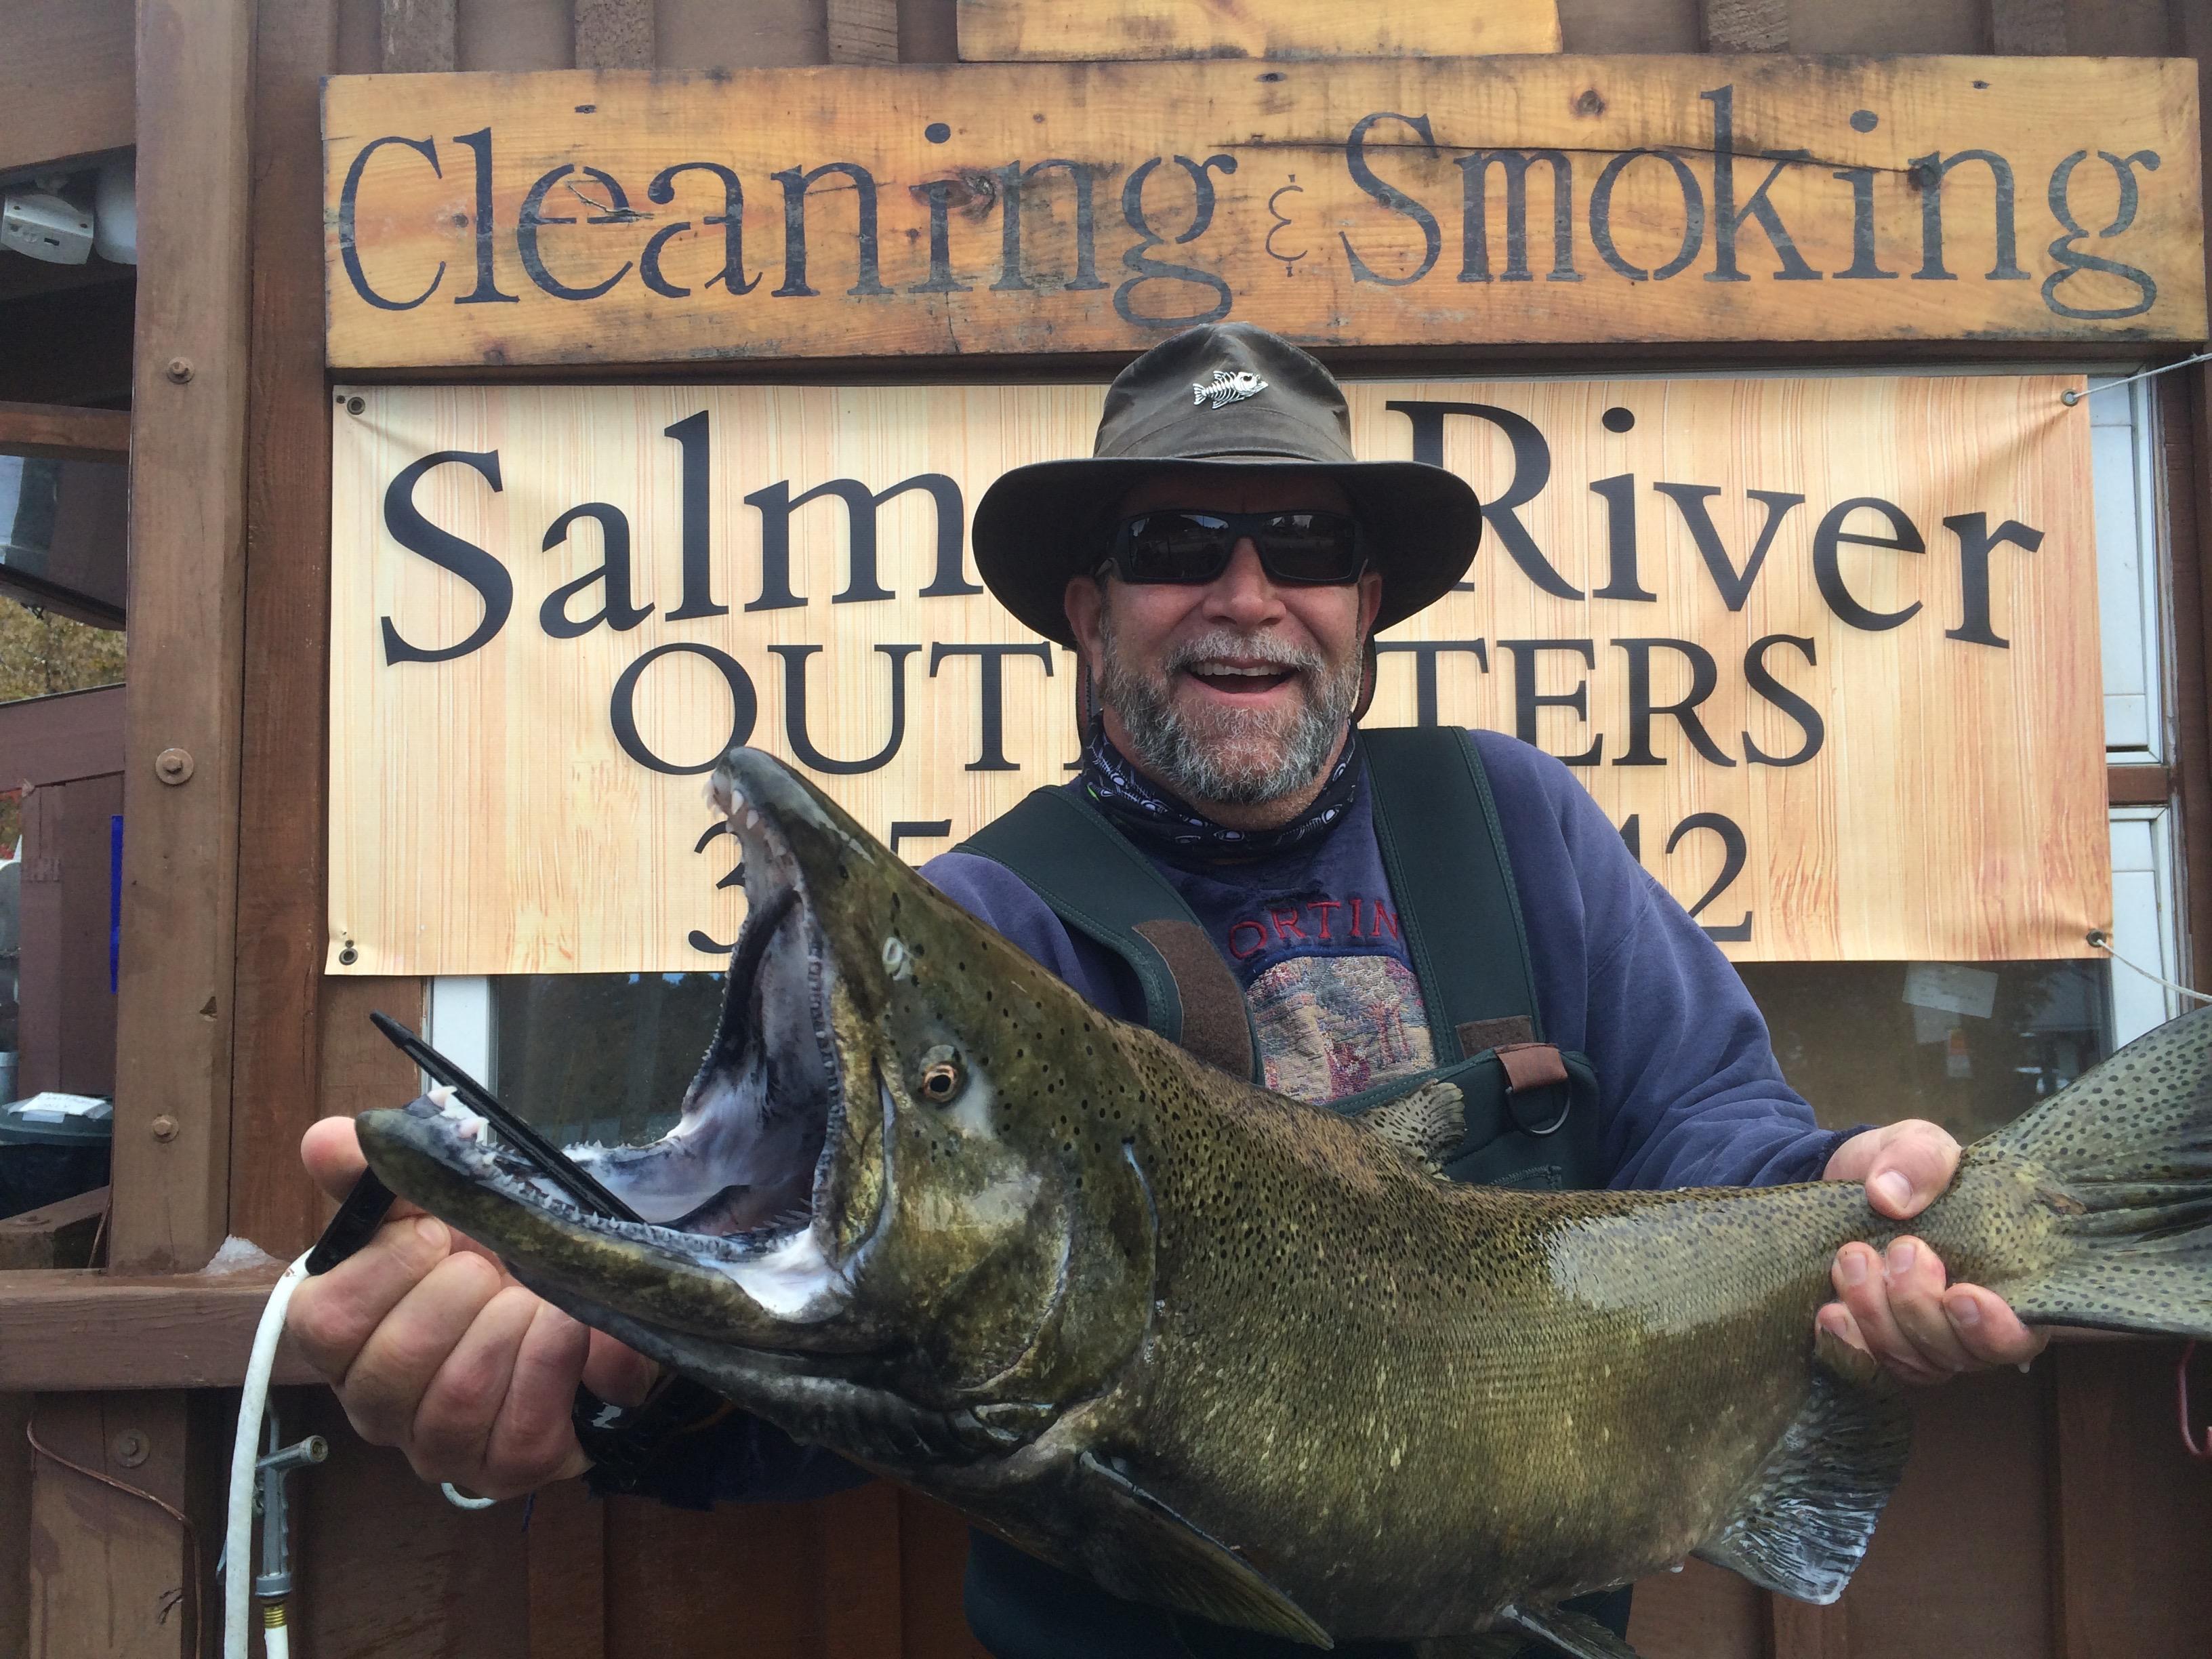 Salmon River Salmon Fishing